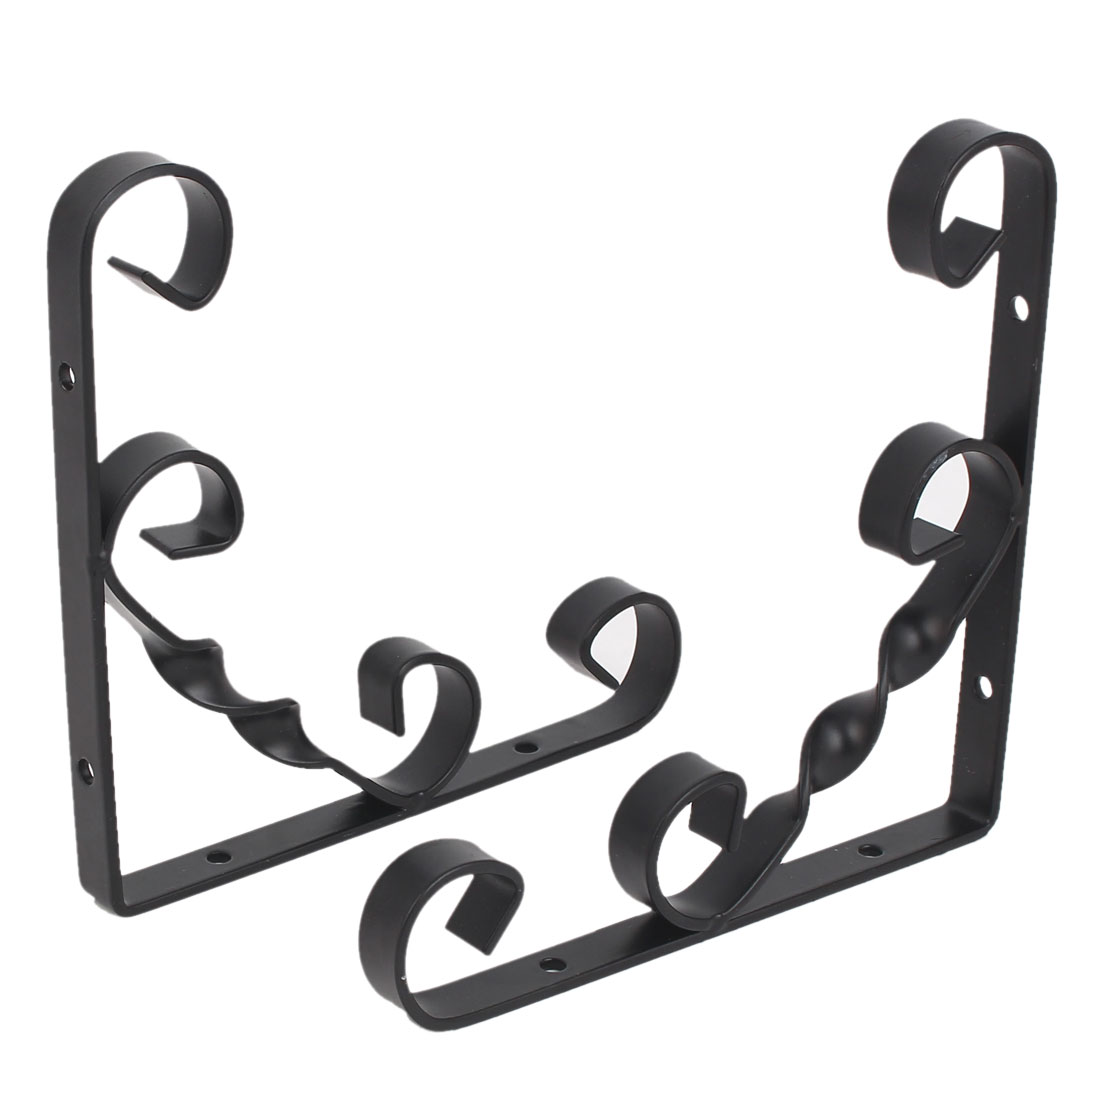 150mm x 150mm 90 degree Wall Mounted Shelf Bracket Brace Support Black 2pcs